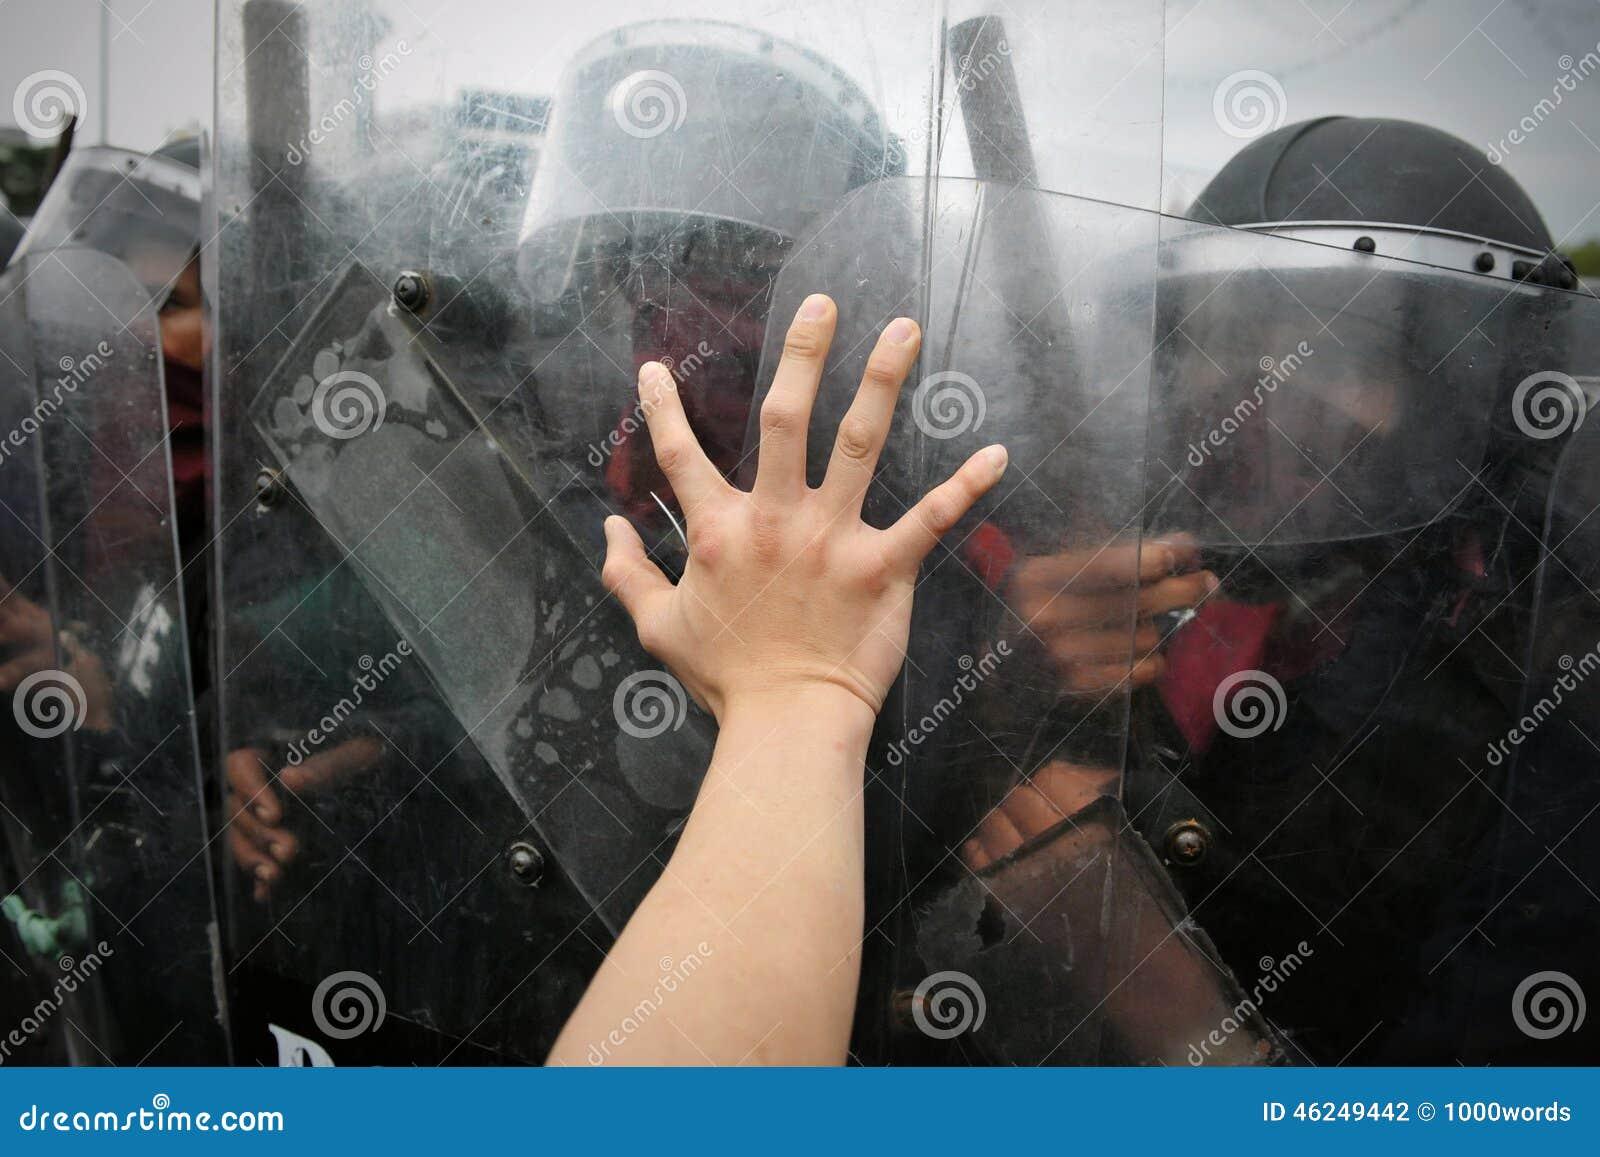 Protestador e polícia